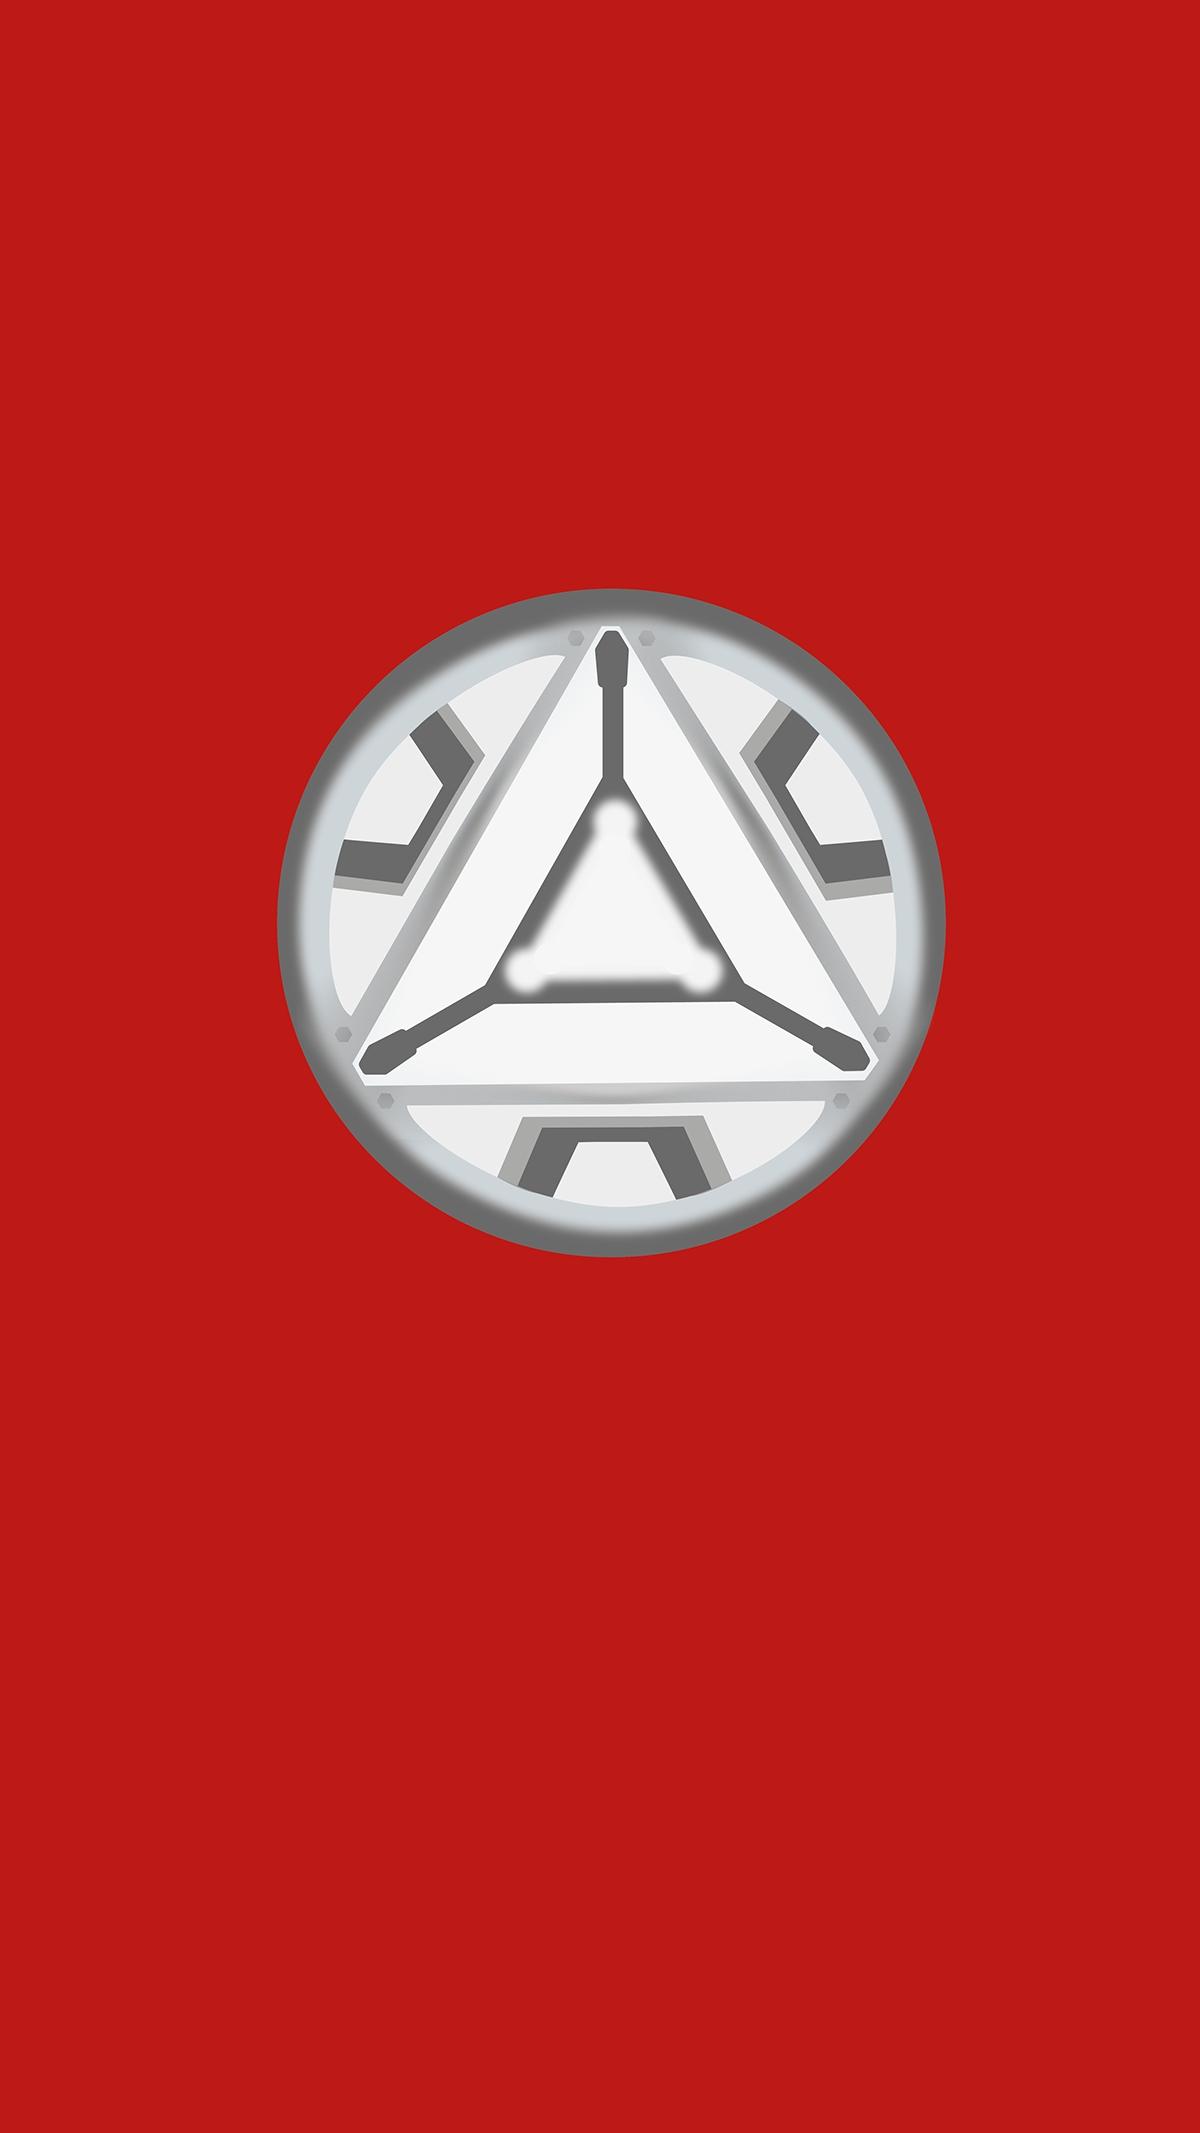 Iron Man Arc Reactor Simple iPhone Wallpaper